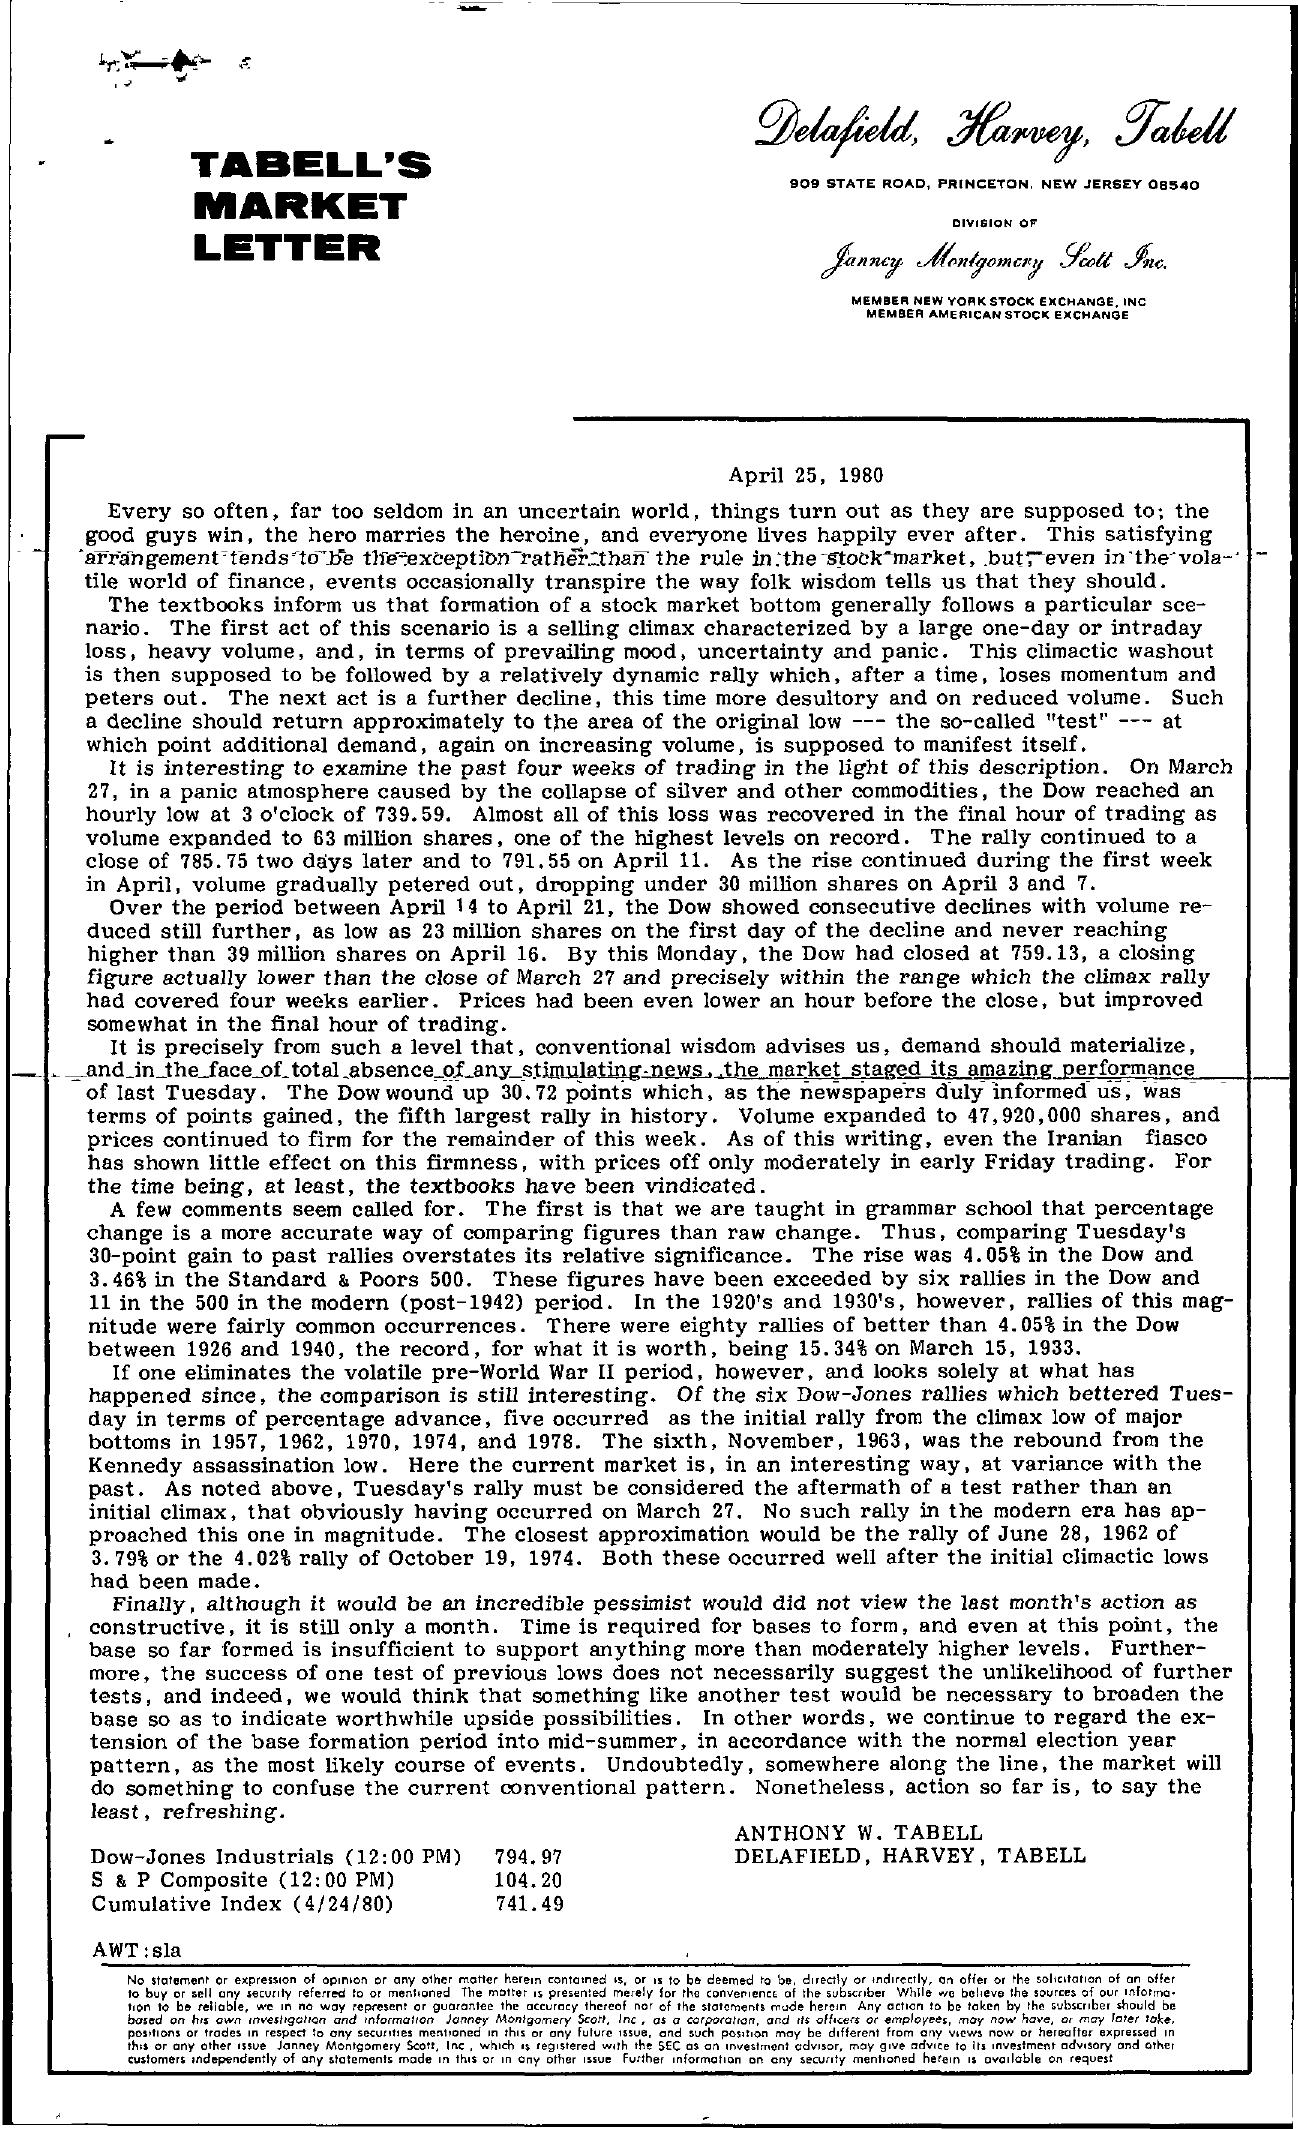 Tabell's Market Letter - April 25, 1980